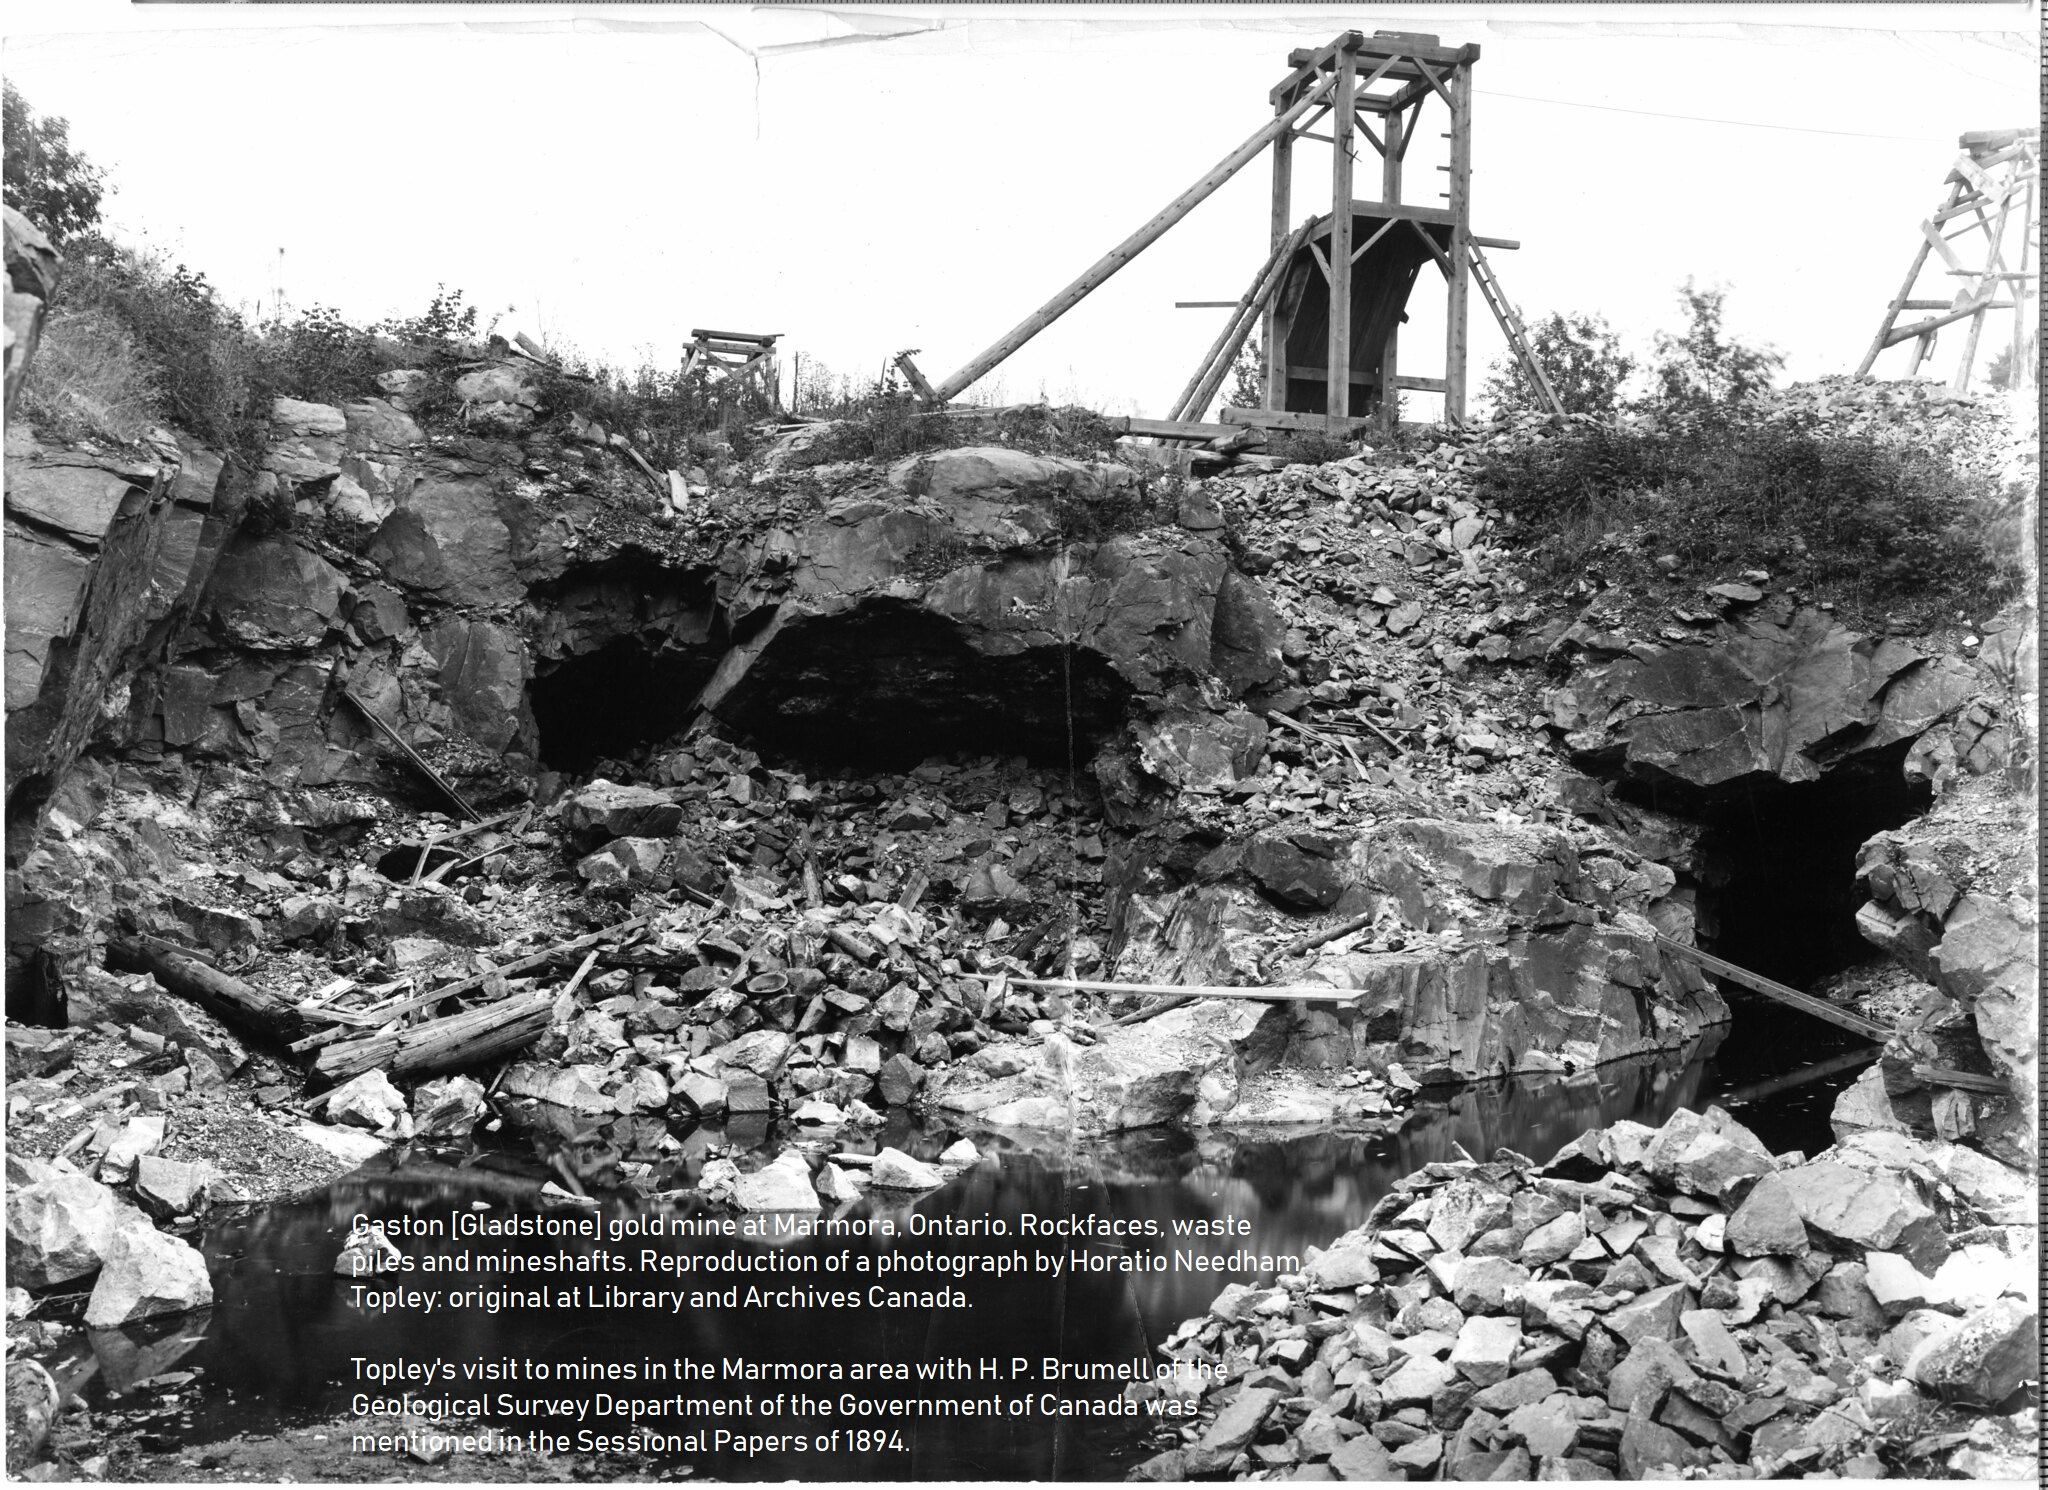 Gladstone Mine (gold) c. 1880  Lot 17, Concession XI. .jpg